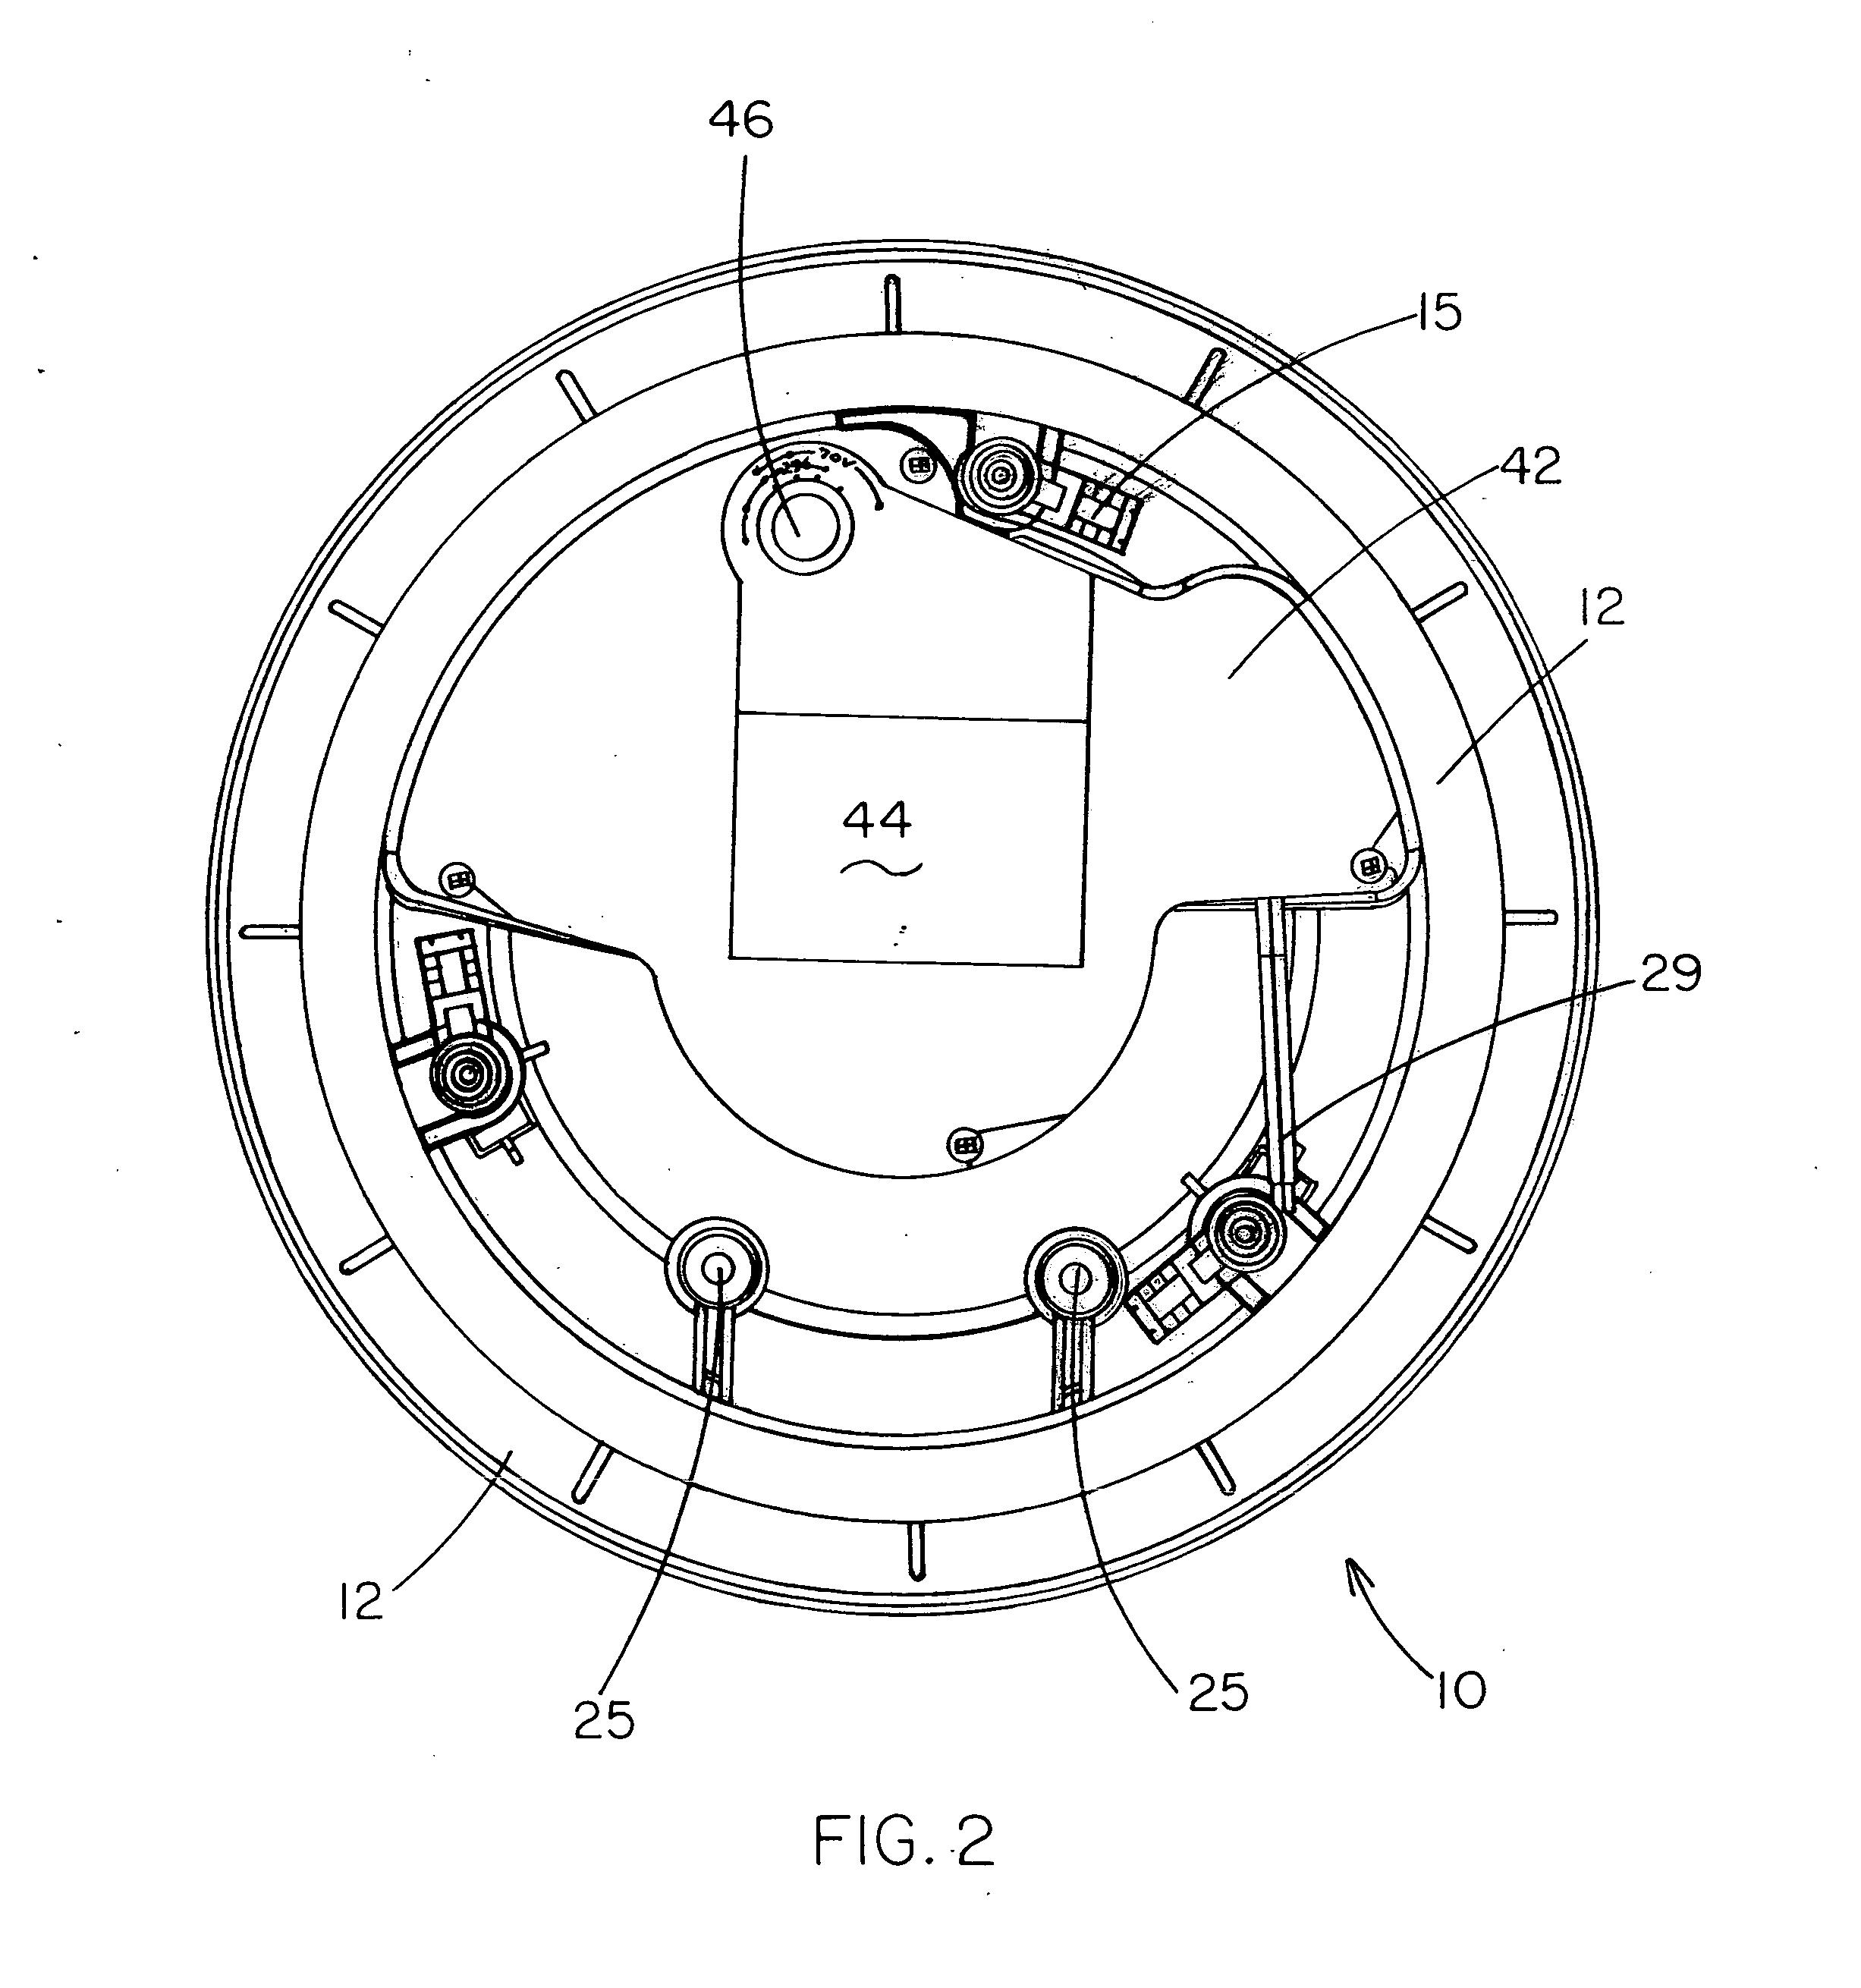 70 volt speaker systems wiring diagram on 70v speaker wire diagram